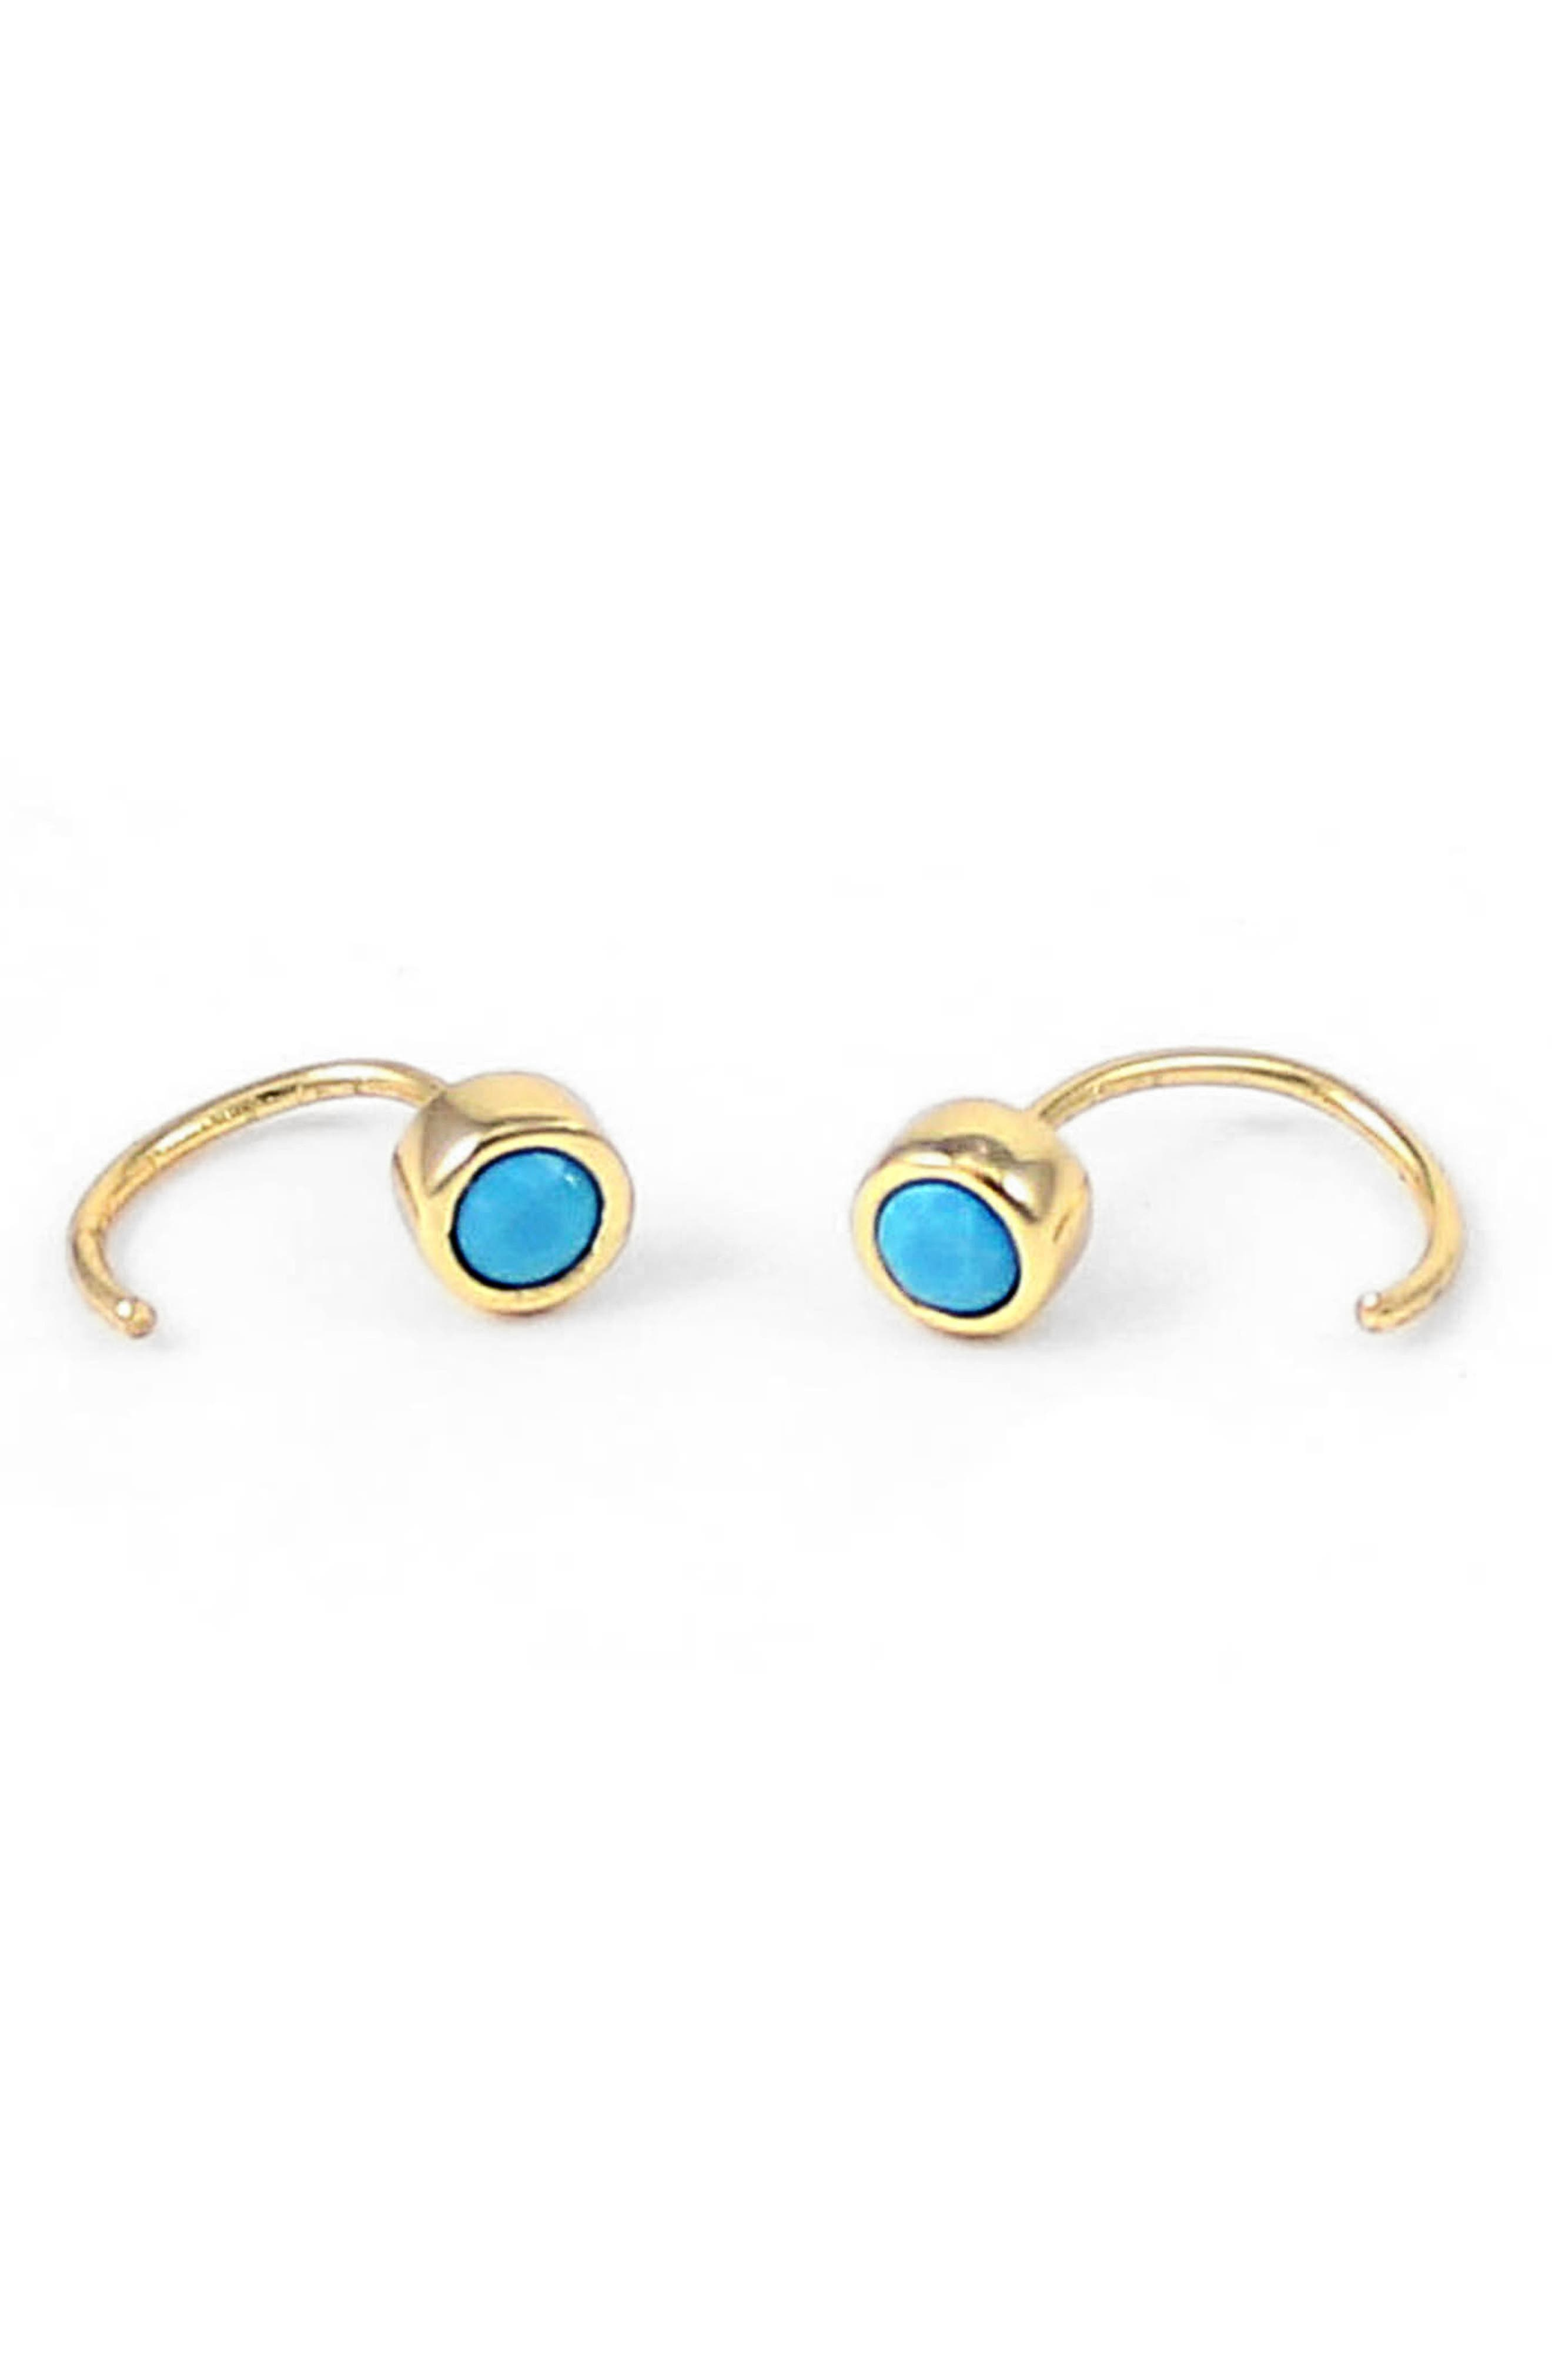 Main Image - Kris Nations Tiny Stone Hoop Earrings